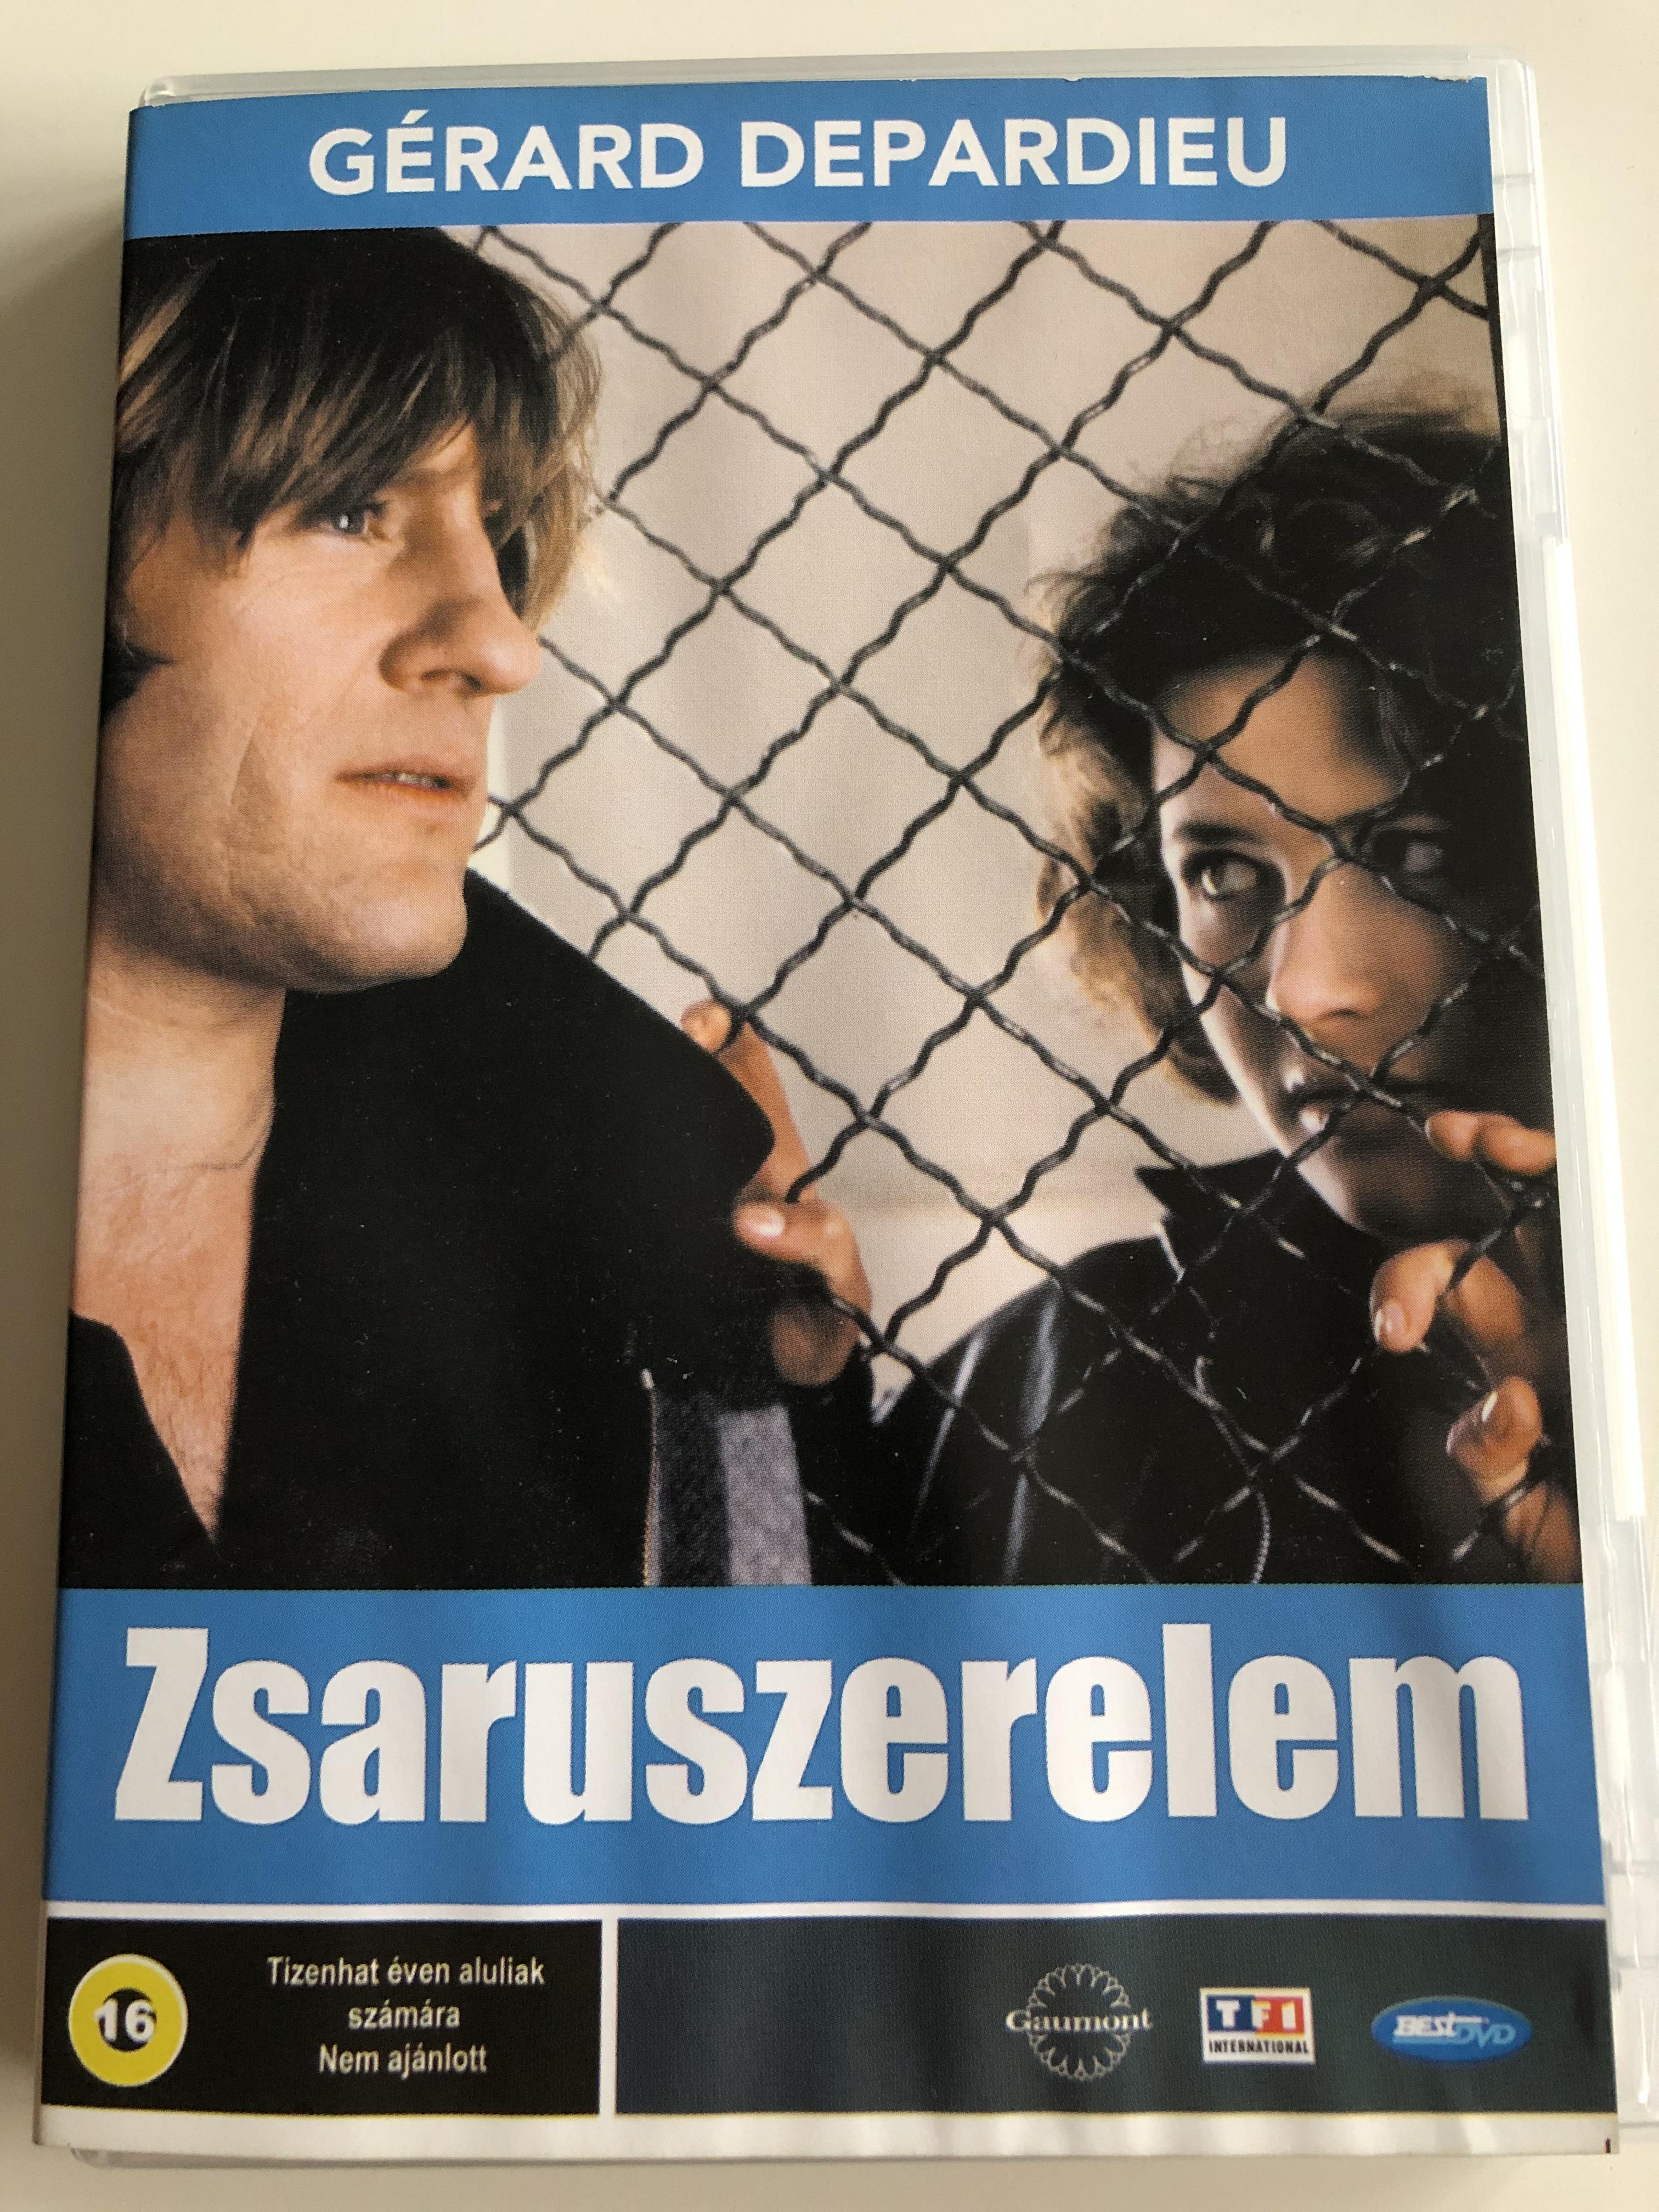 police-dvd-1985-zsaruszerelem-directed-by-maurice-pialat-starring-g-rard-depardieu-sophie-marceau-richard-anconina-sandrine-bonnaire-1-.jpg